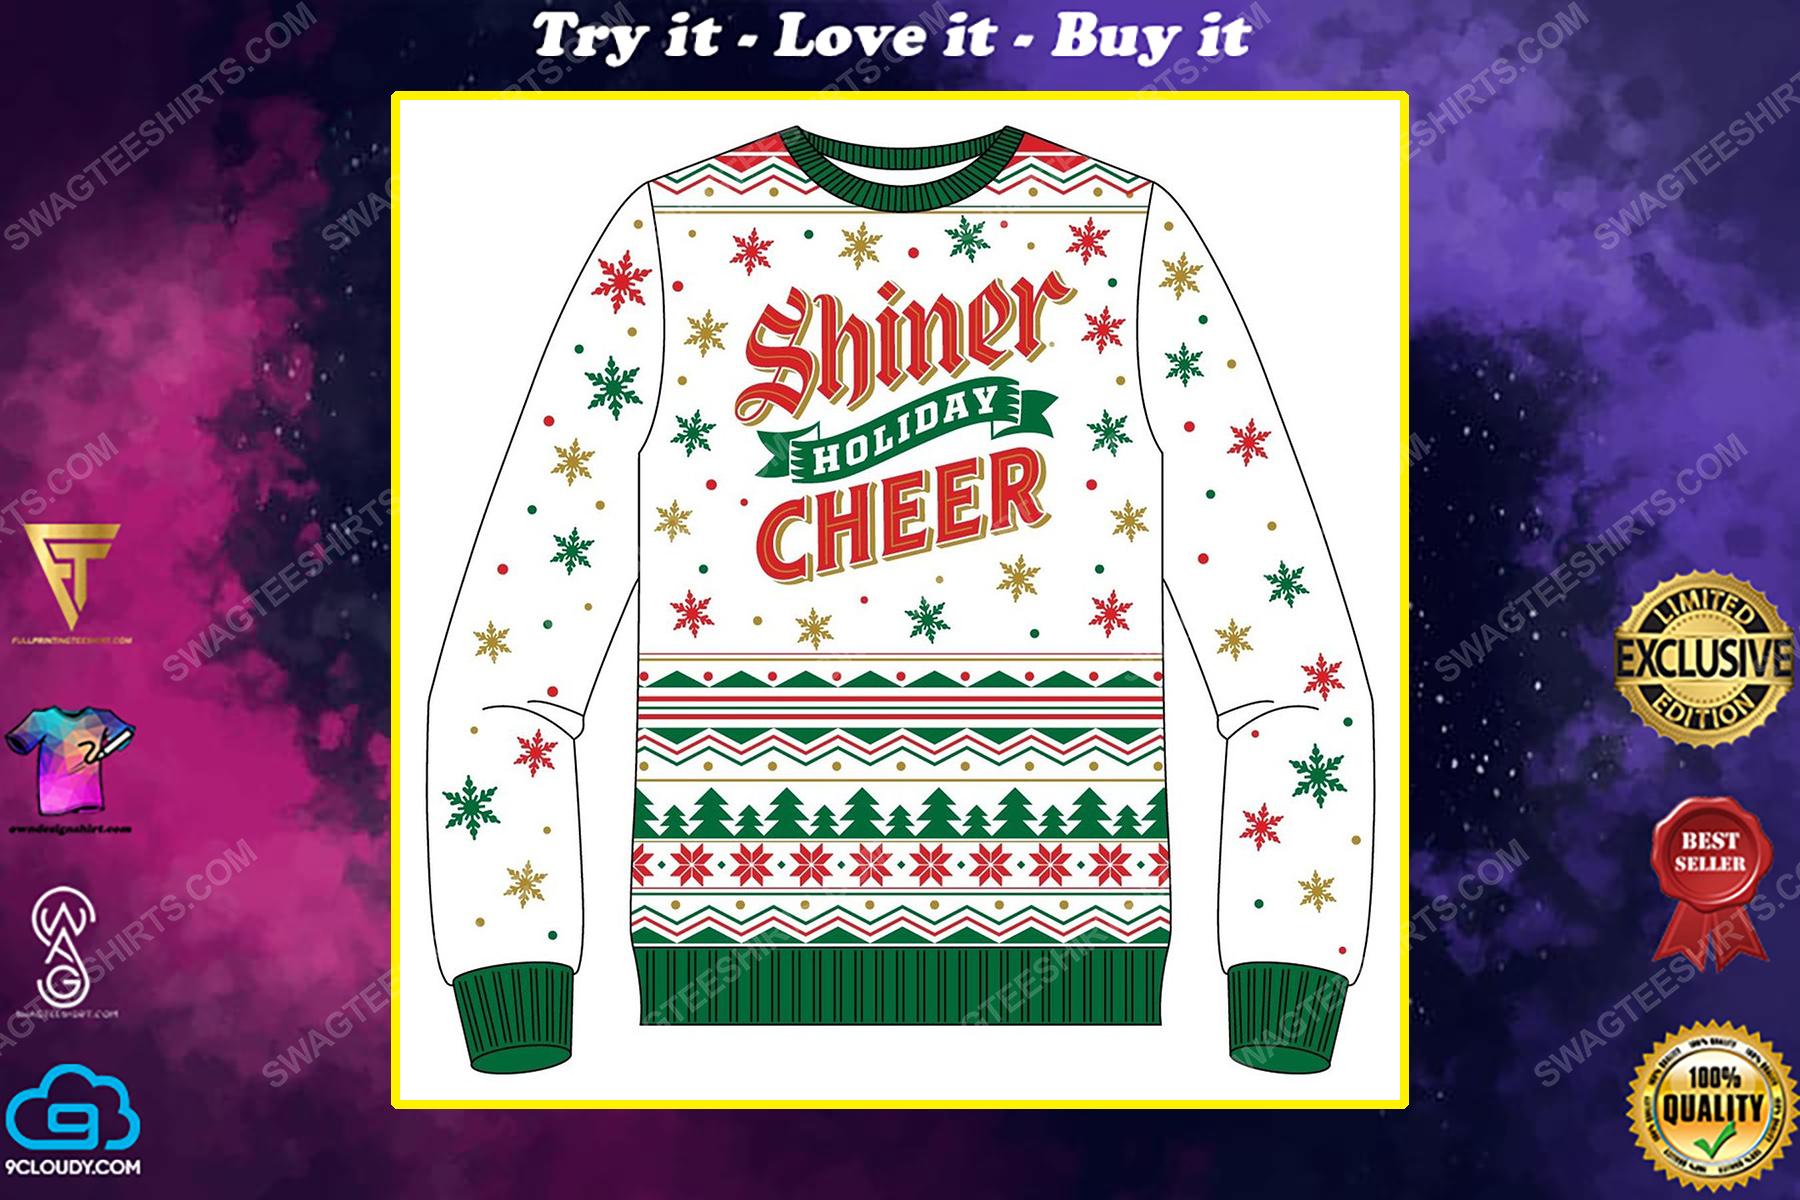 Shiner holiday cheer full print ugly christmas sweater